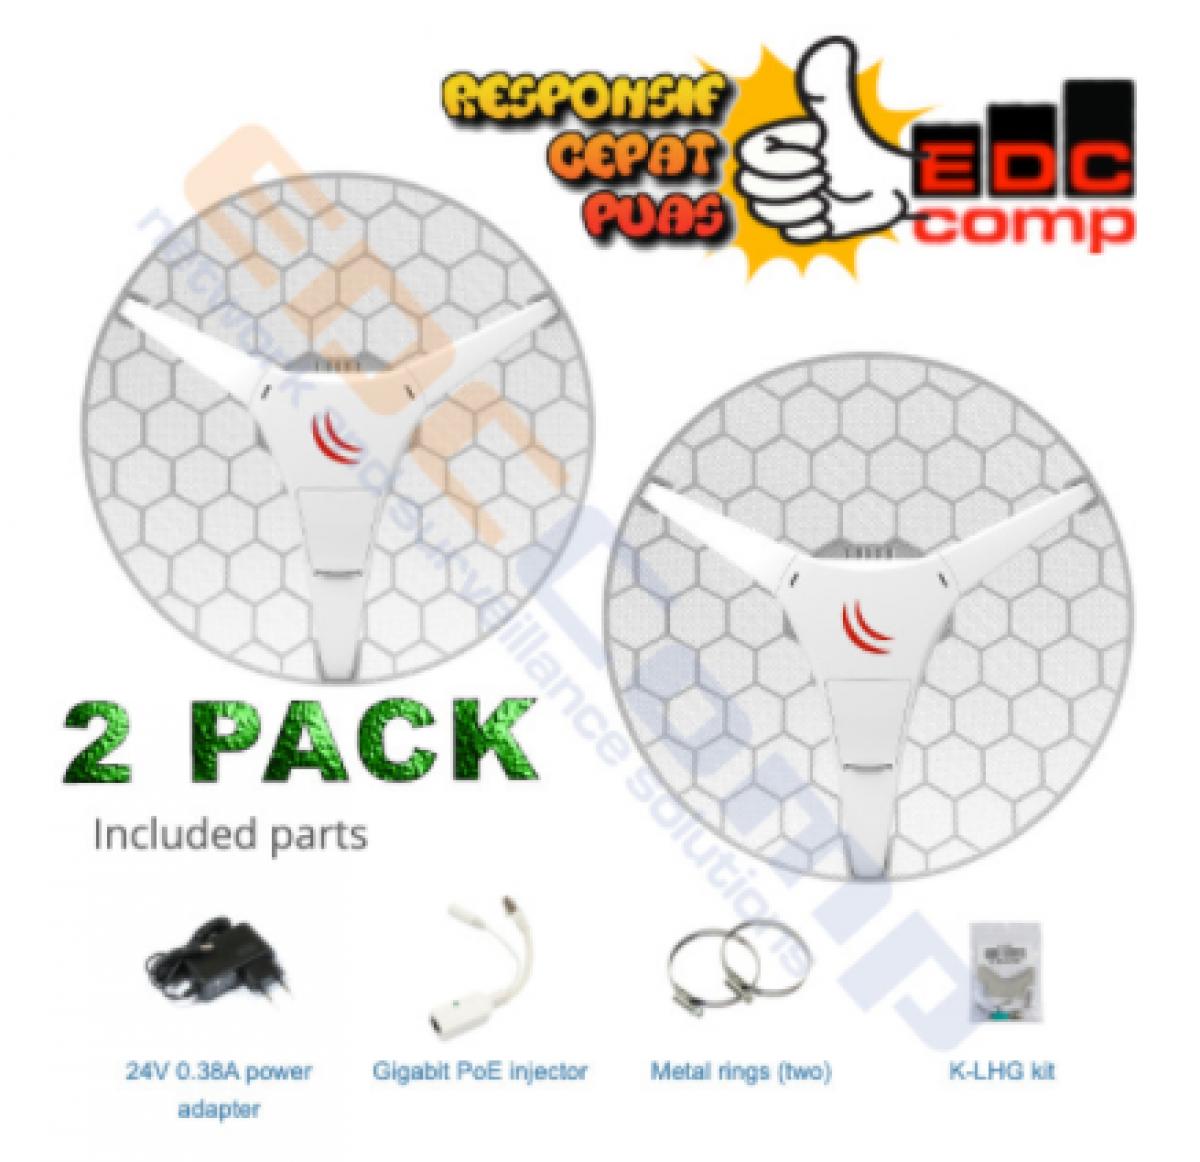 Embedded Wireless MikroTik RBLHGG-5acD-XL - RB LHG 5ACD XL 2PACK - EdcComp